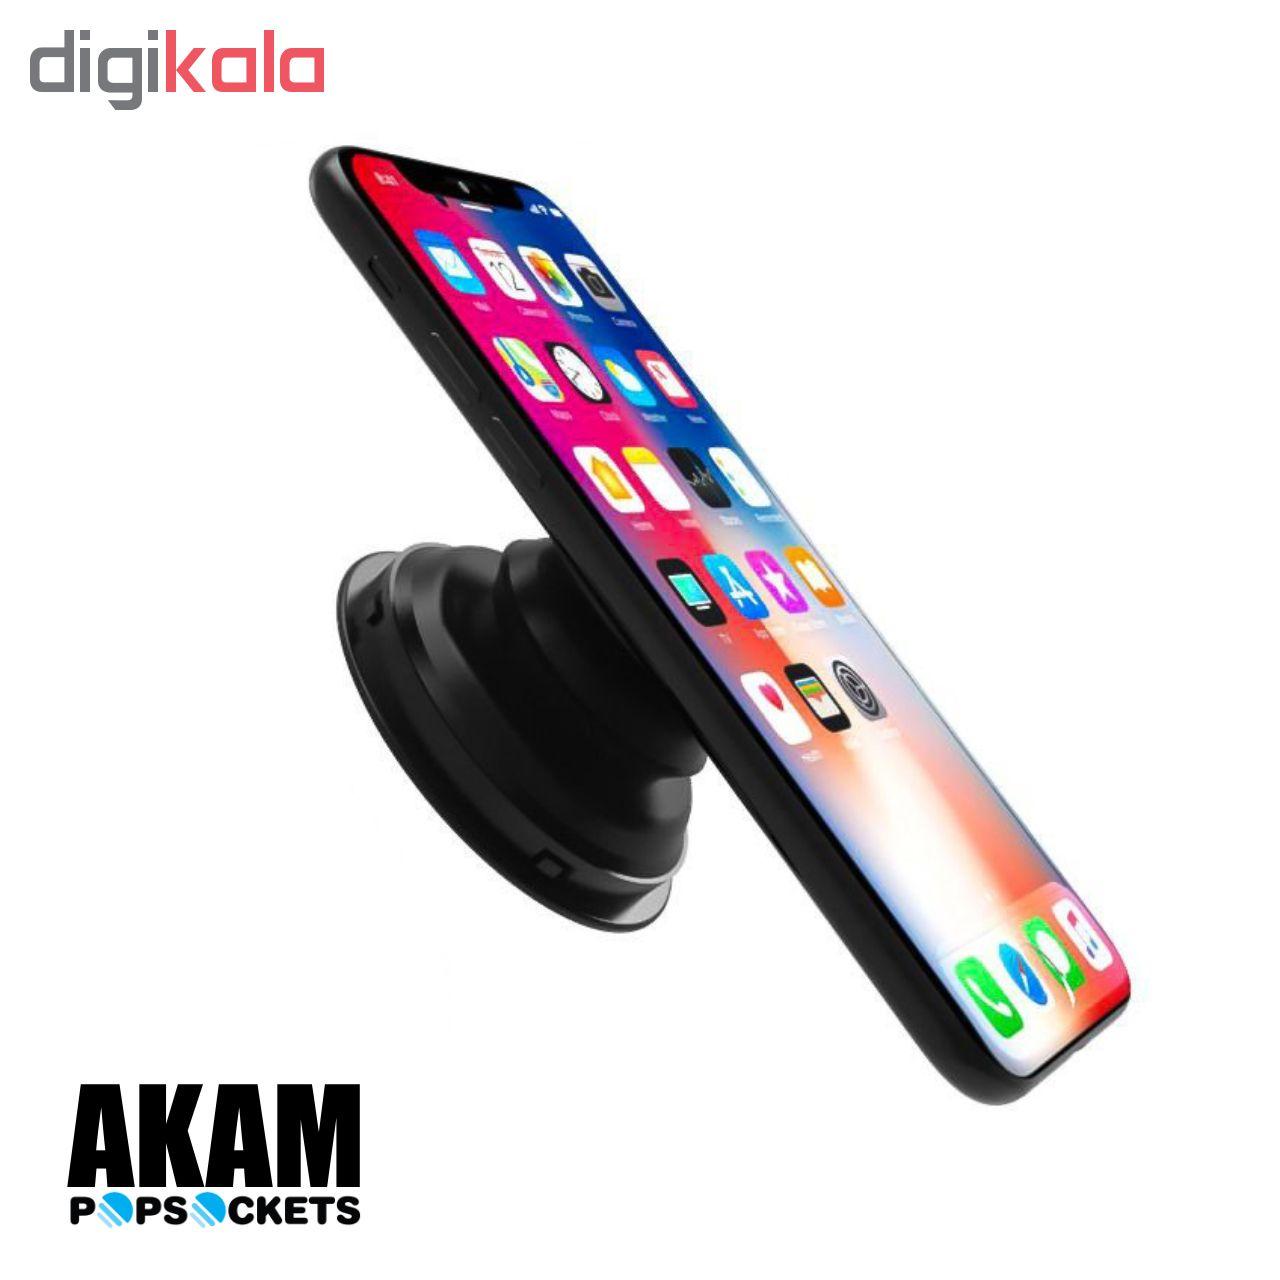 پایه نگهدارنده گوشی موبایل پاپ سوکت آکام مدل APS0079 main 1 6